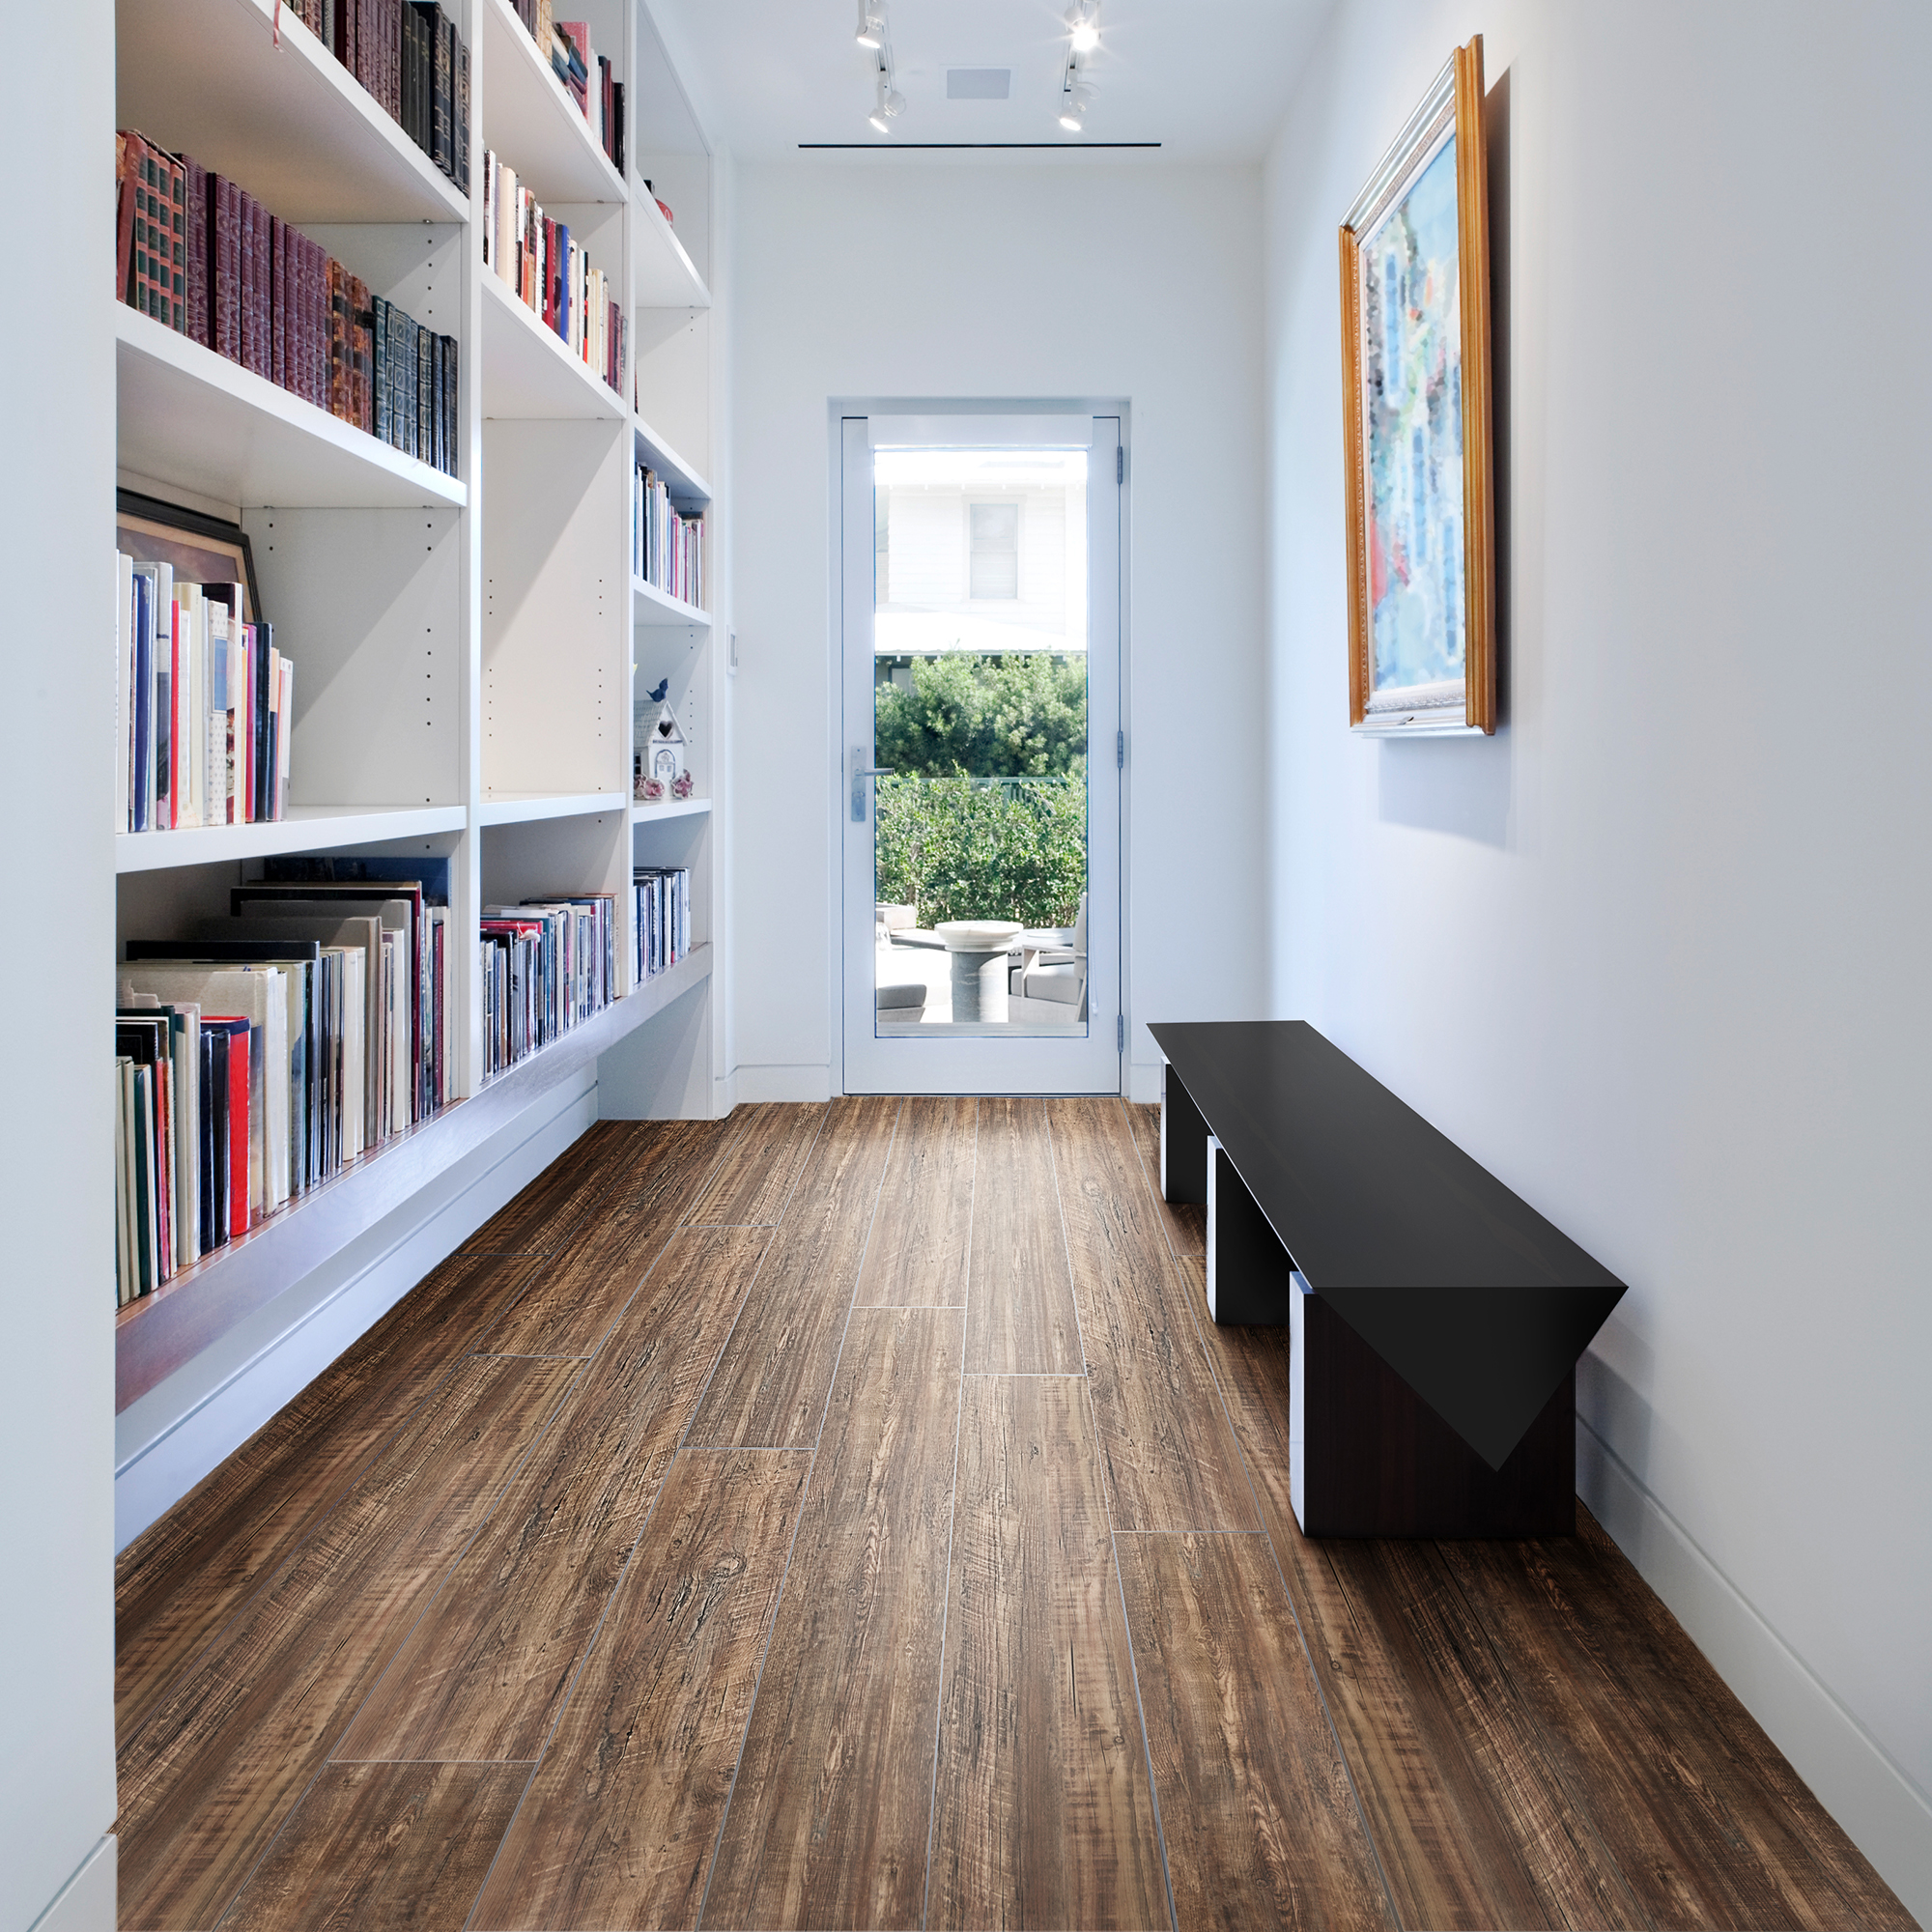 Achim Nexus Granite 12x12 Self Adhesive Vinyl Floor Tile 20 Tiles Sq Ft